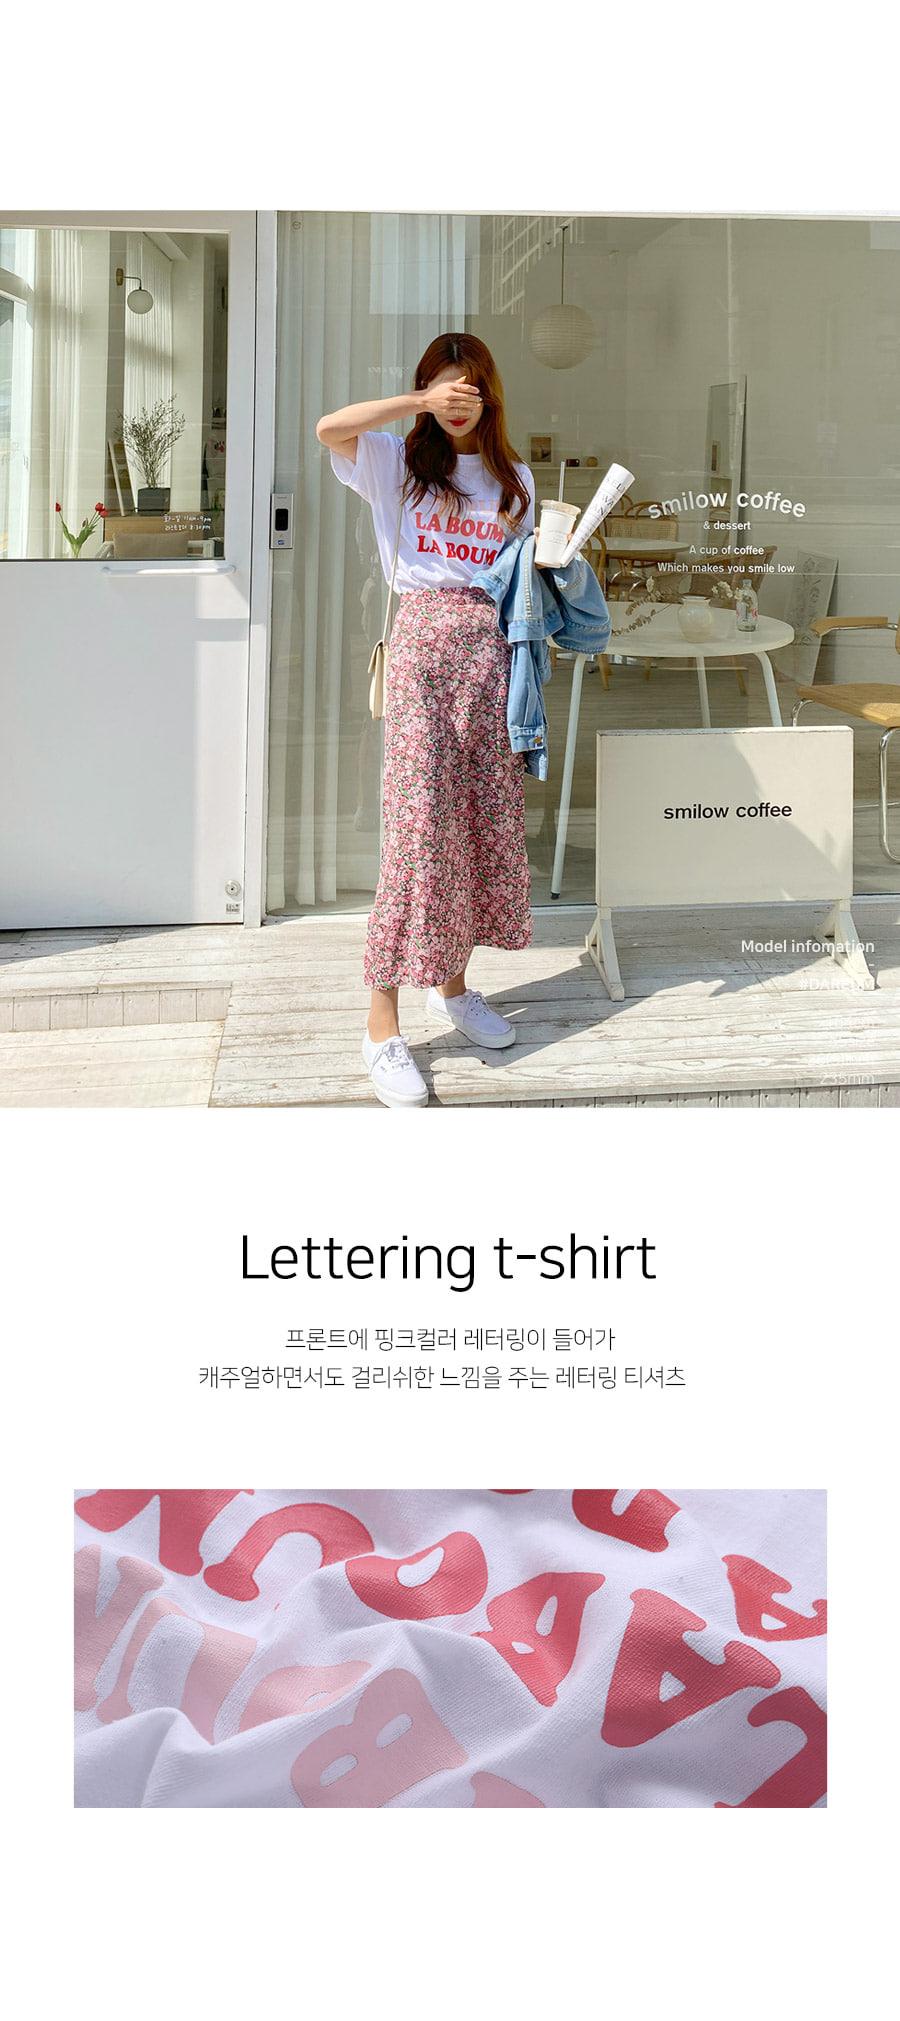 Pink Laboom Lettering T-shirt